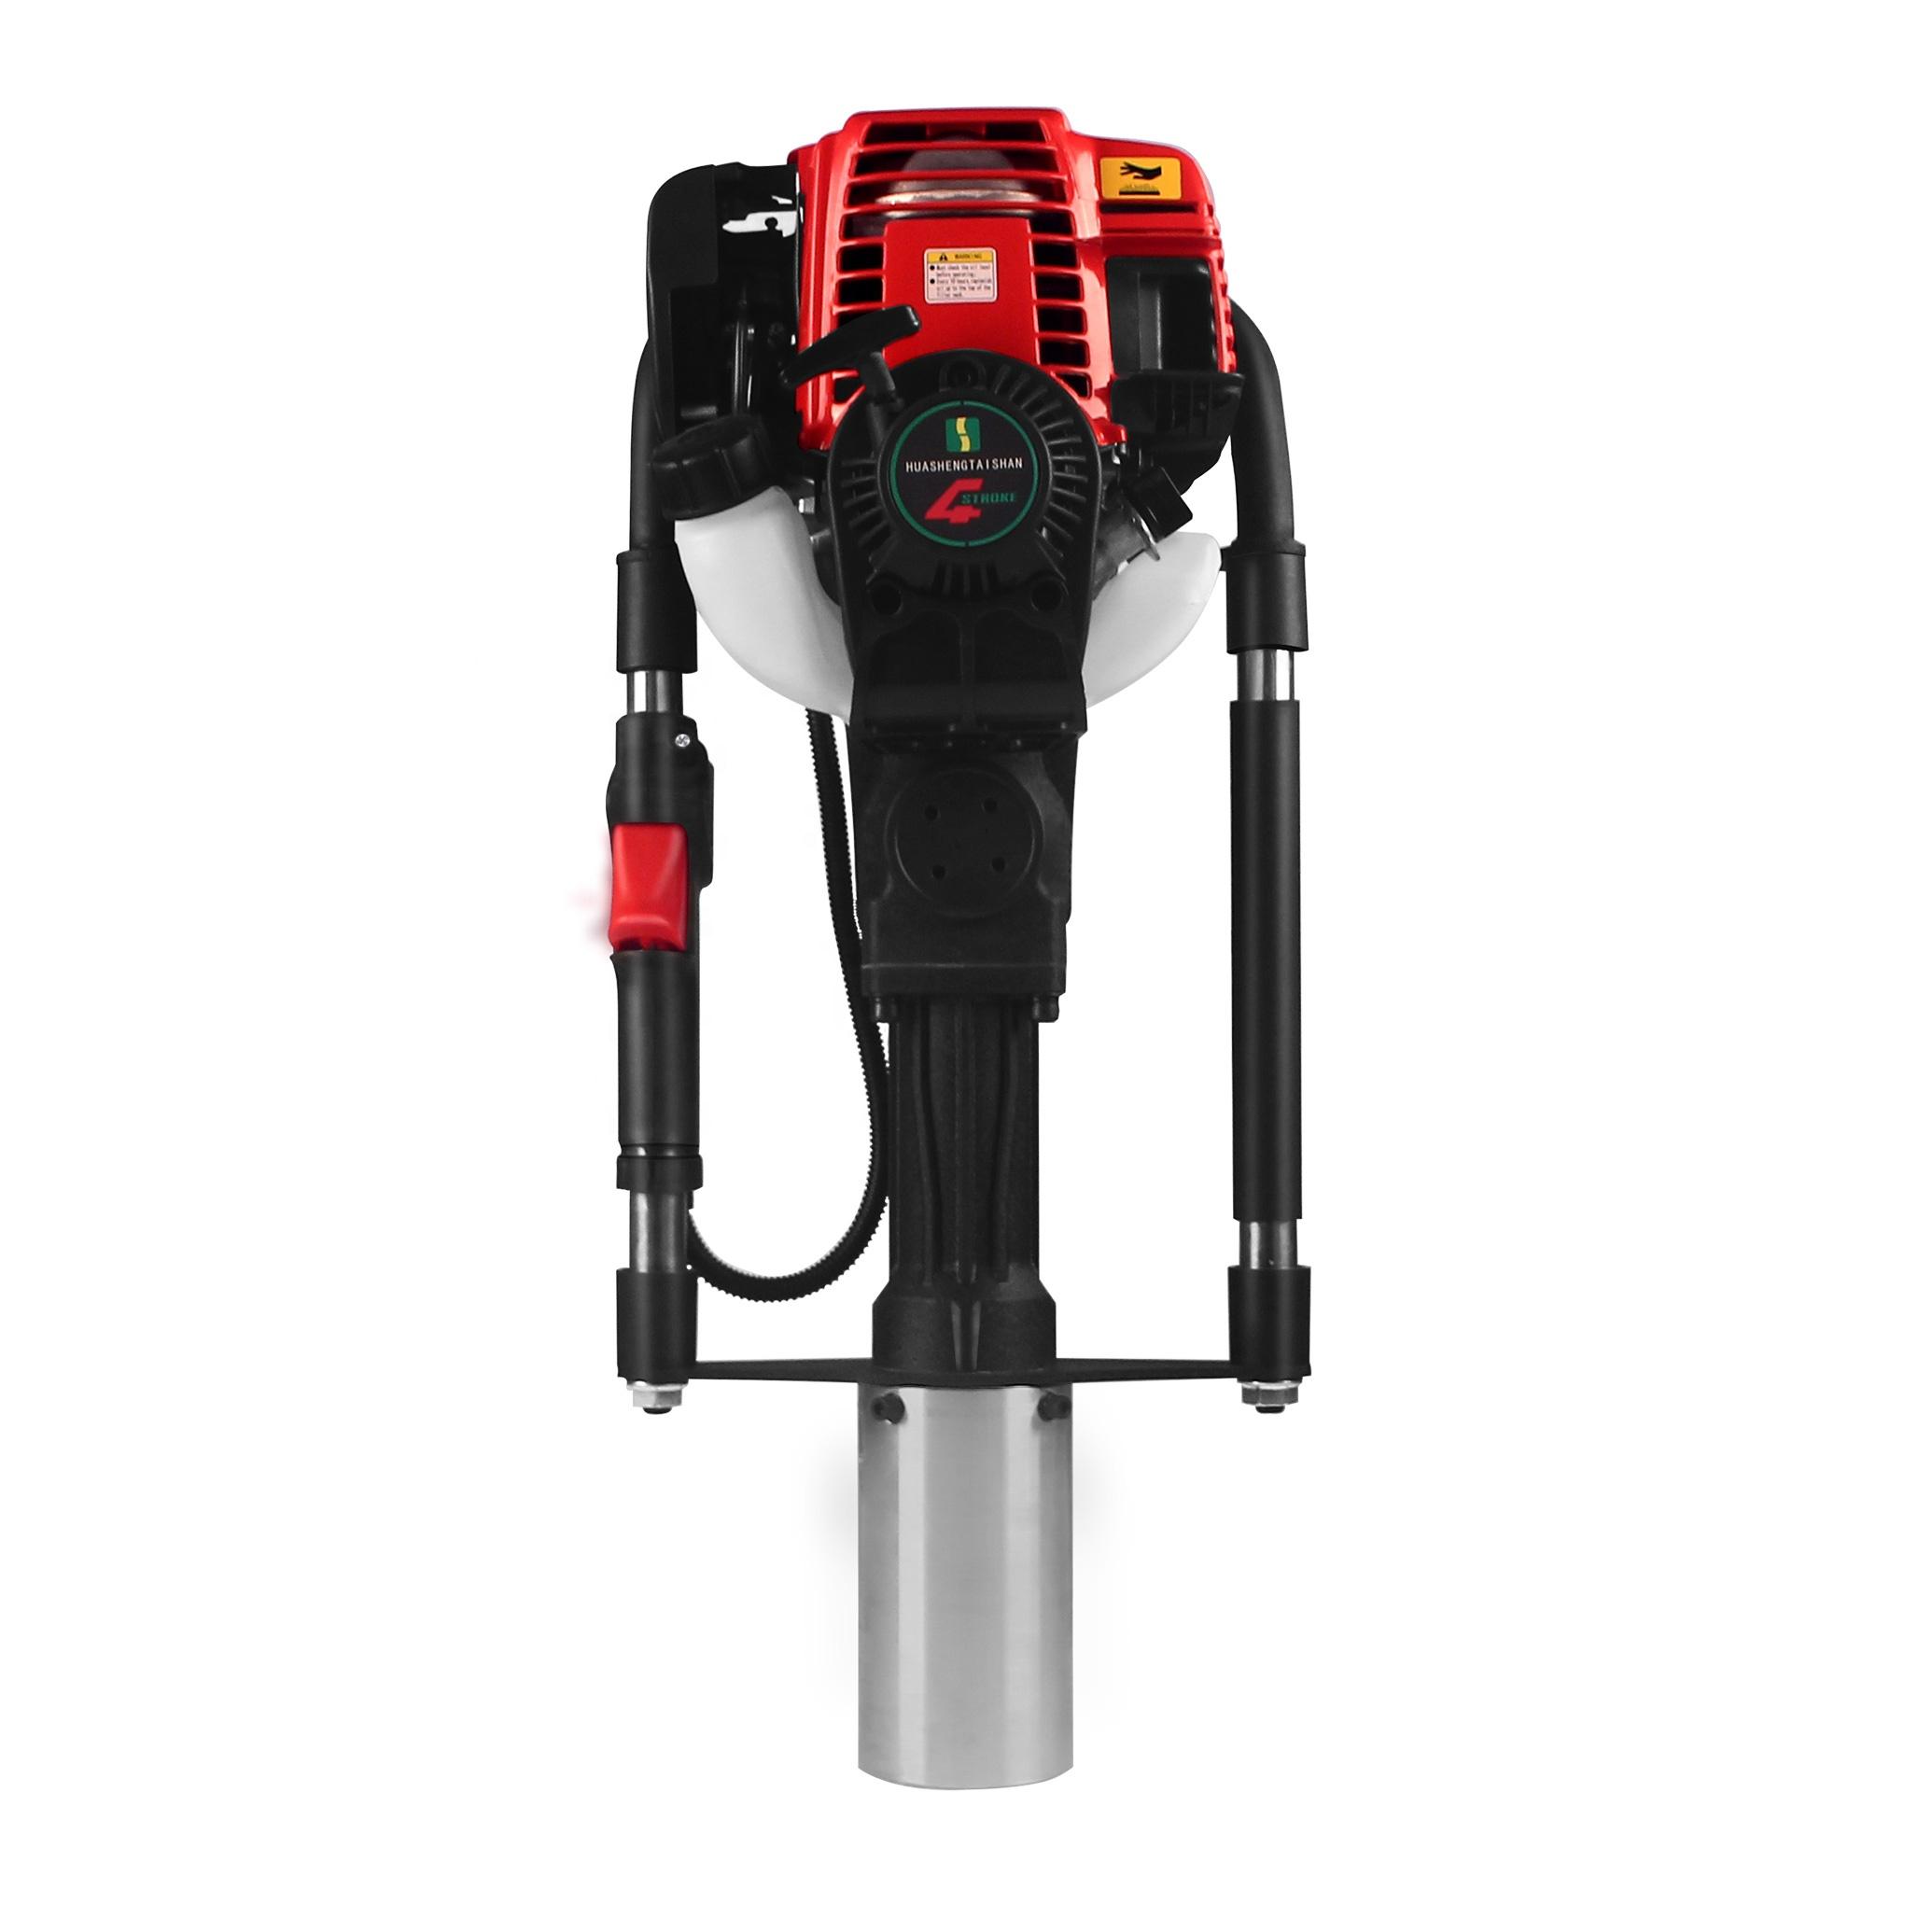 DPD-80 professional 4-stroke post driver vibrating post driver gasoline post driver with CE